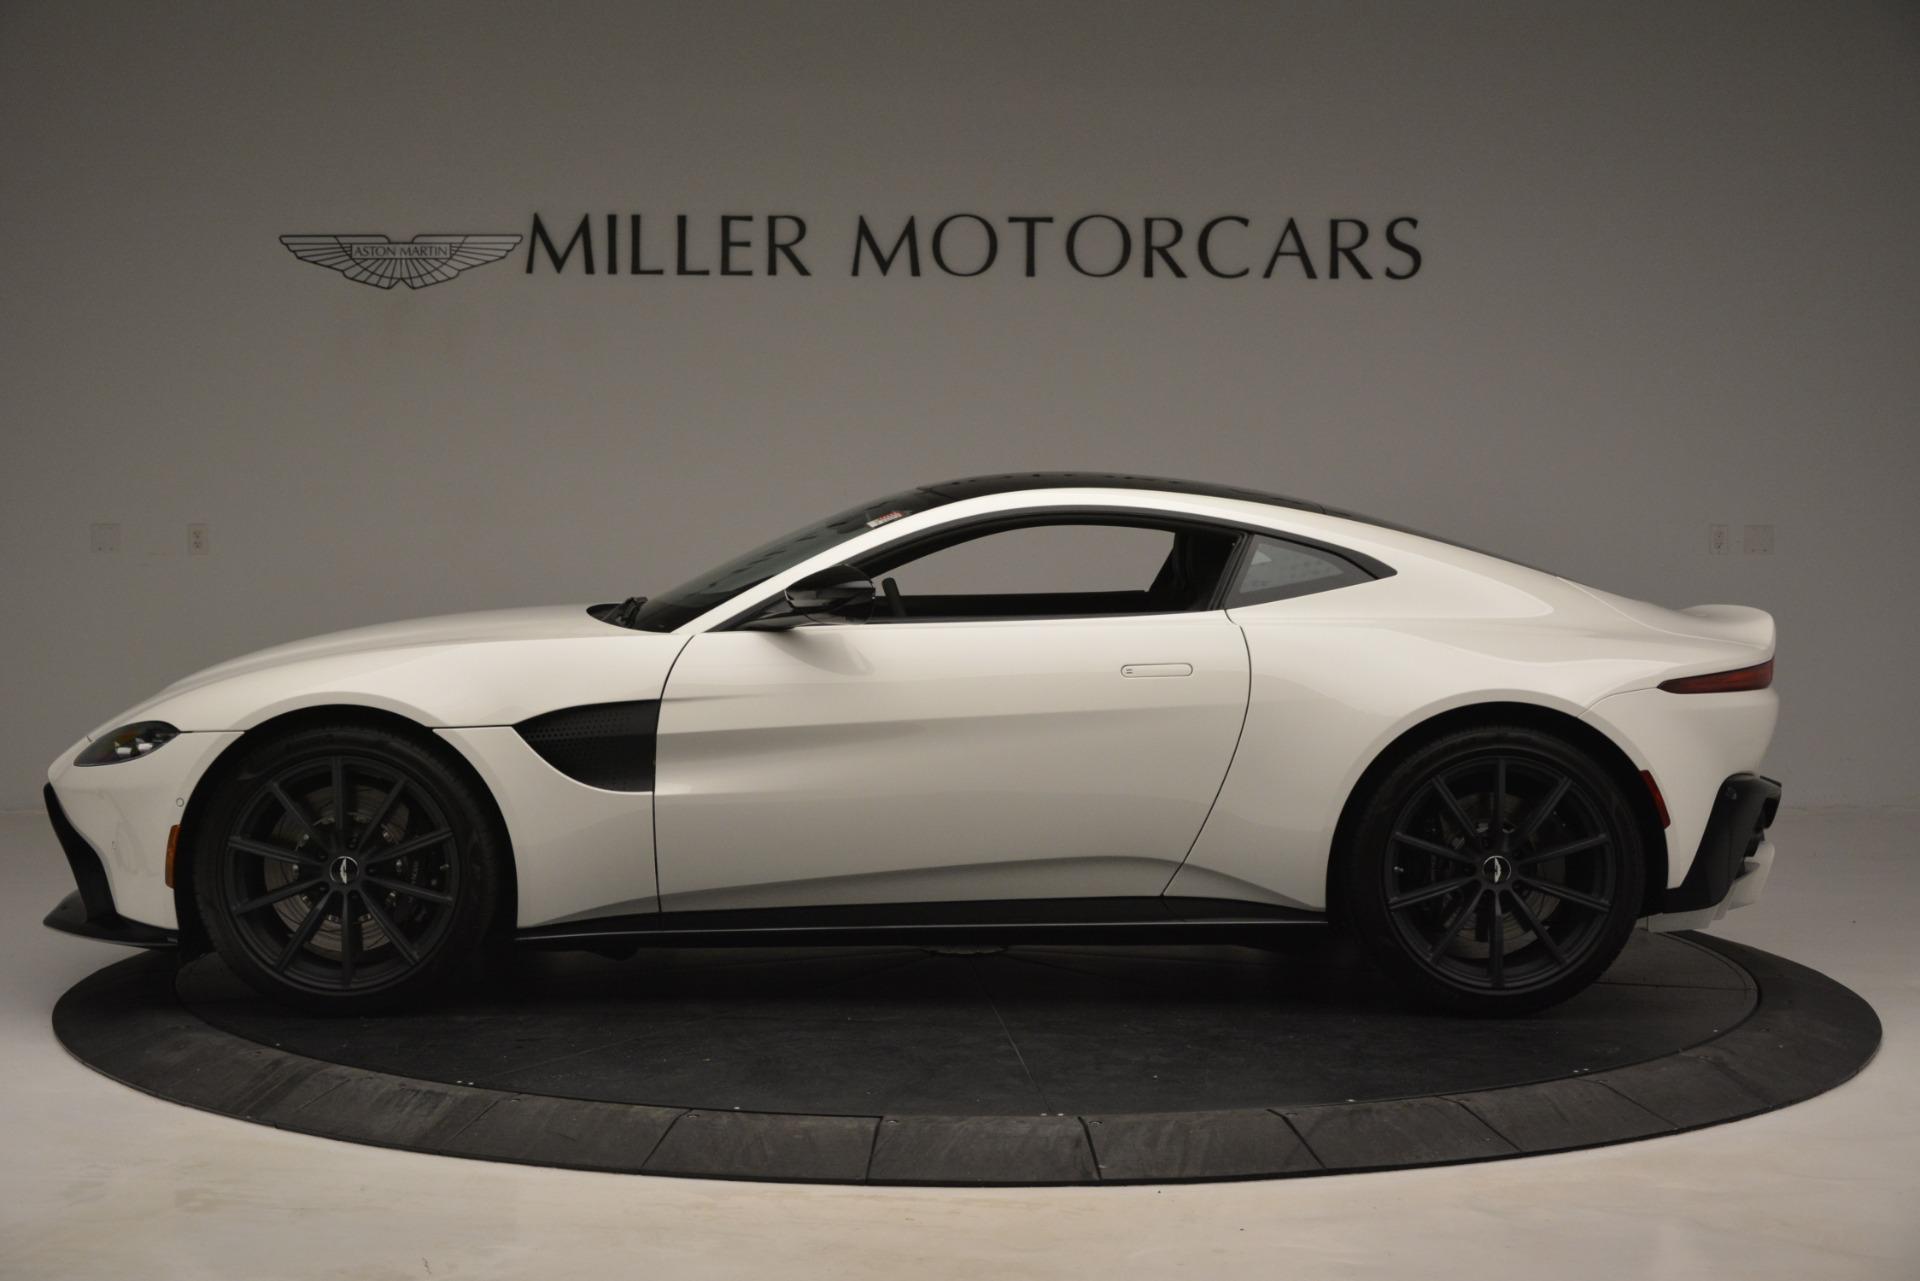 New 2019 Aston Martin Vantage  For Sale In Greenwich, CT 3053_p3